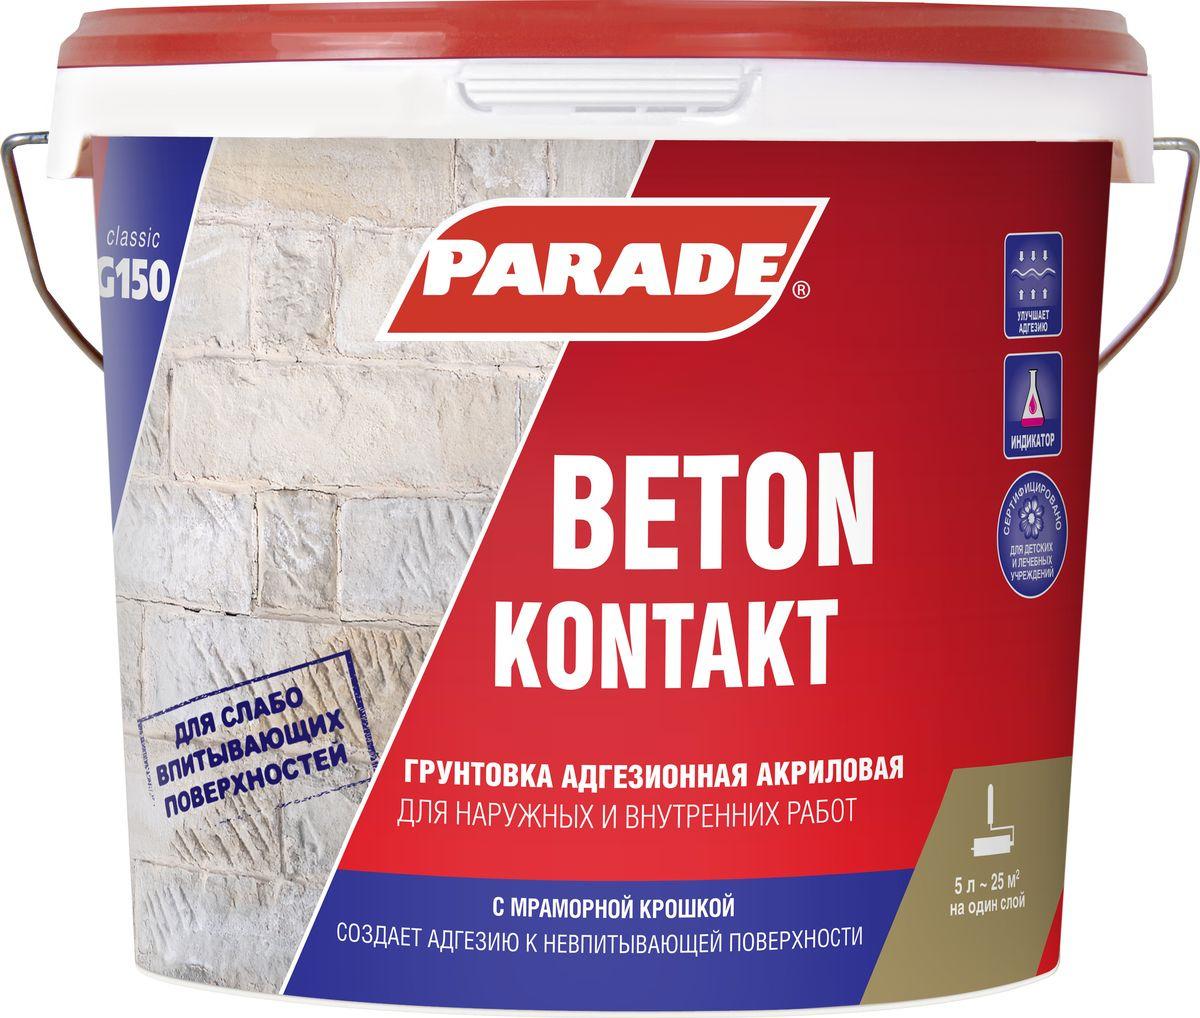 Грунт Parade Beton Kontakt G150, 4603292006499, 5 л цена 2017